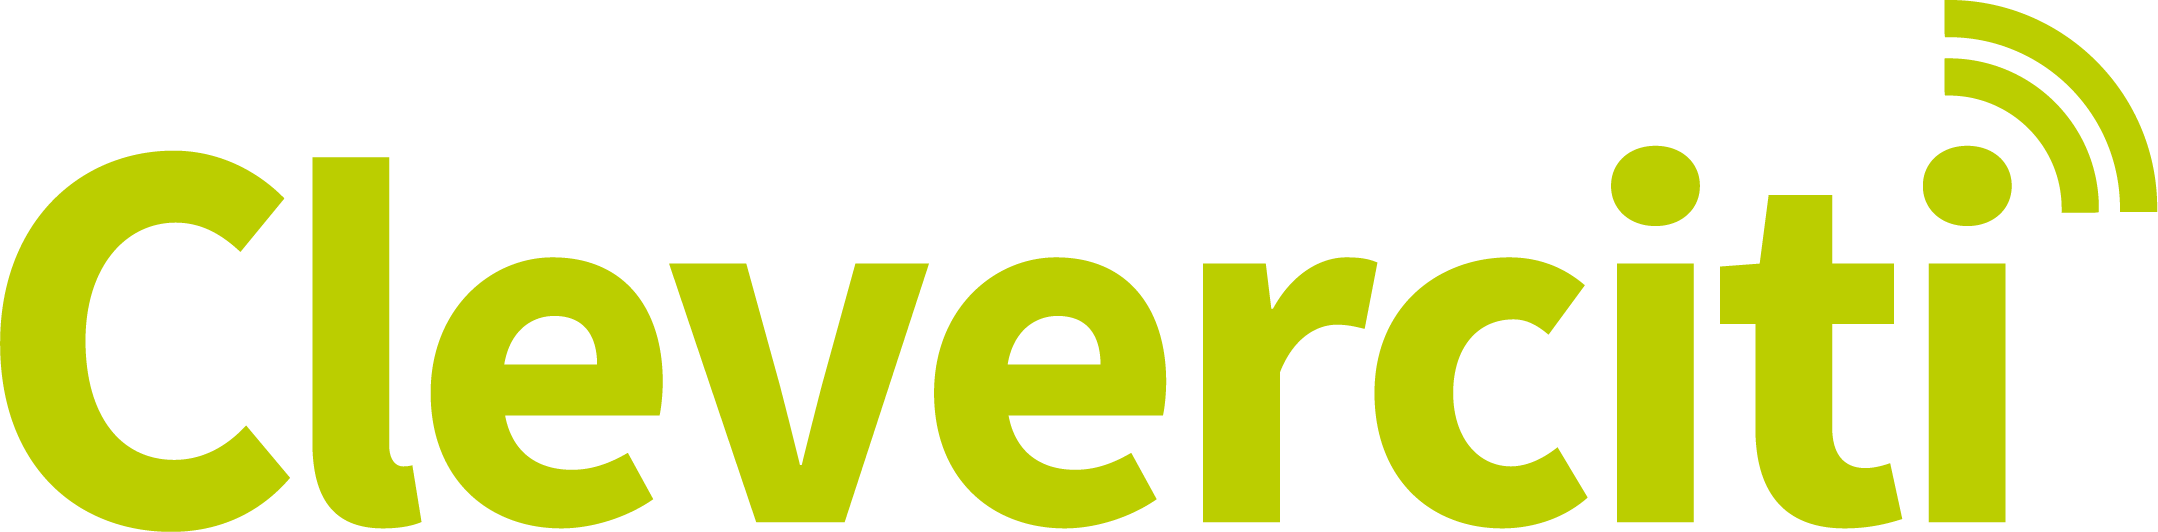 Cleverciti Logo